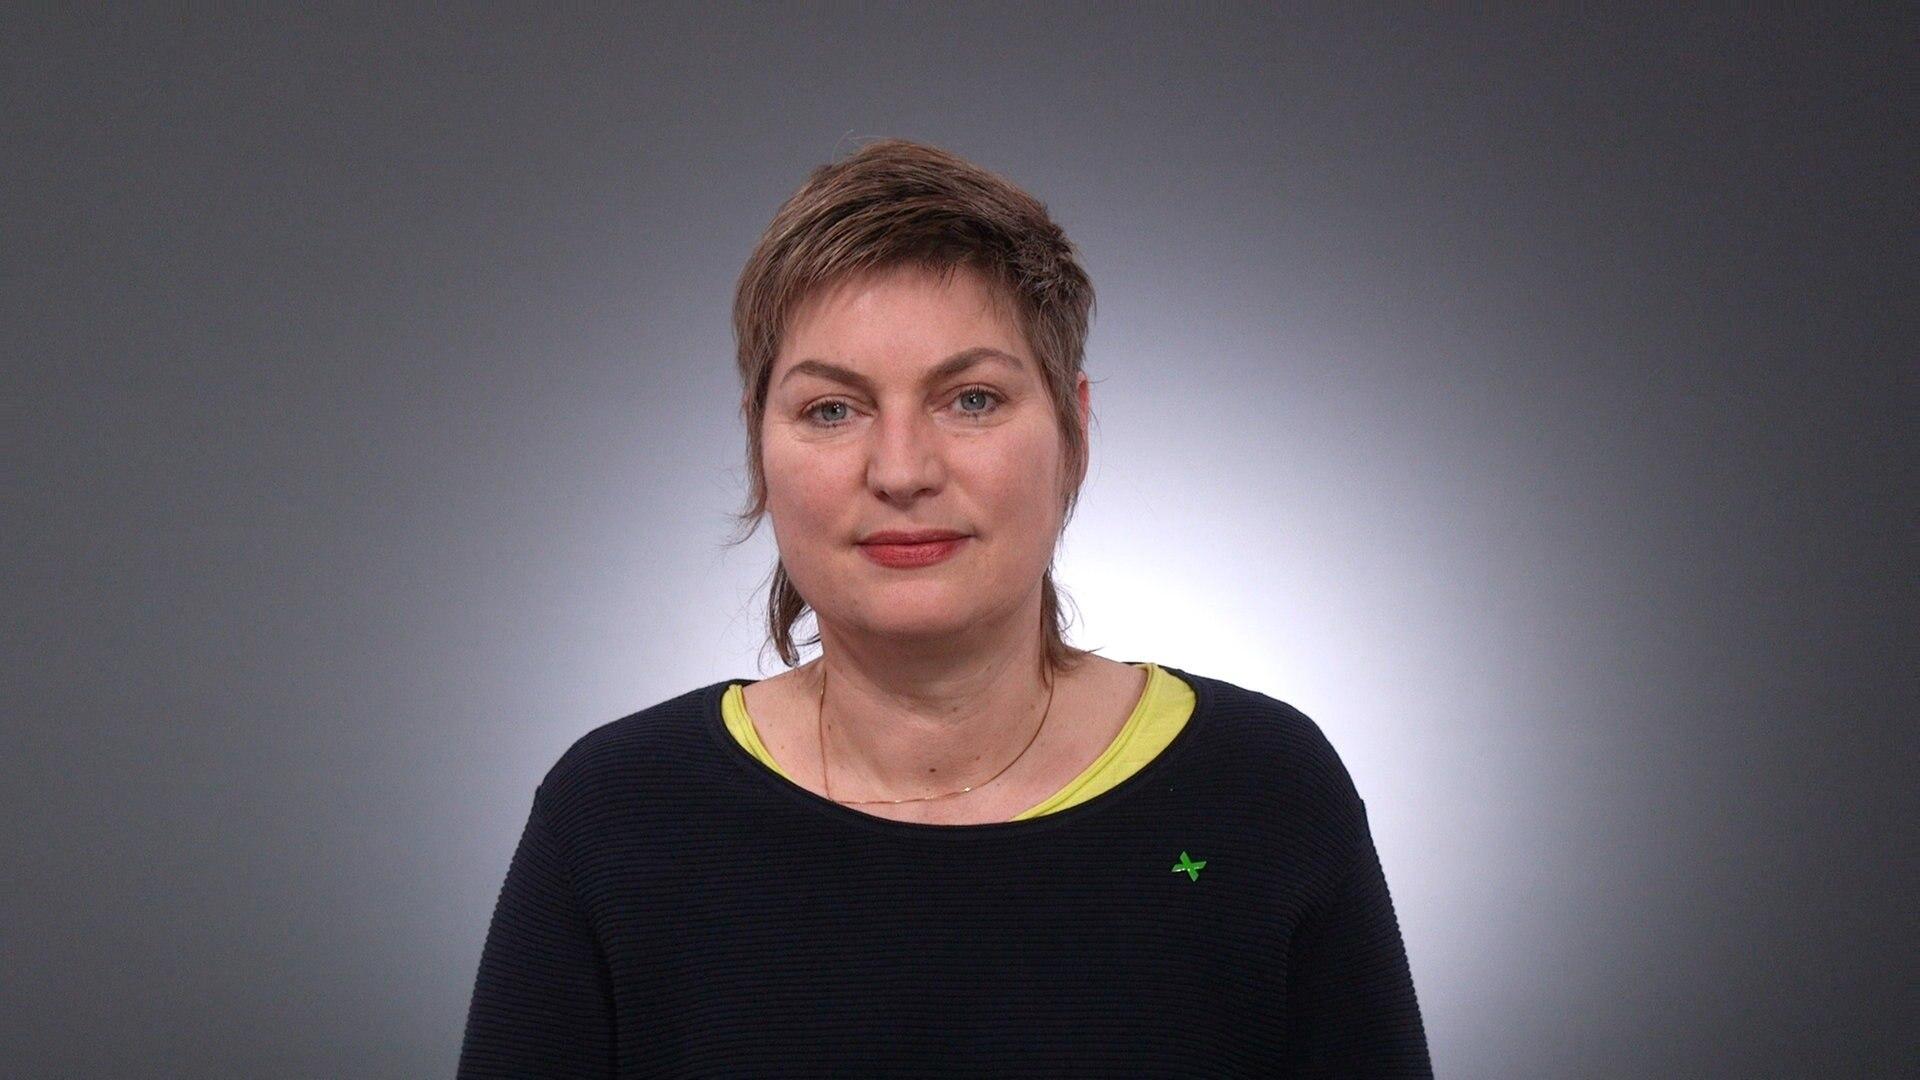 Katrin Kuntze, FREIE WÄHLER